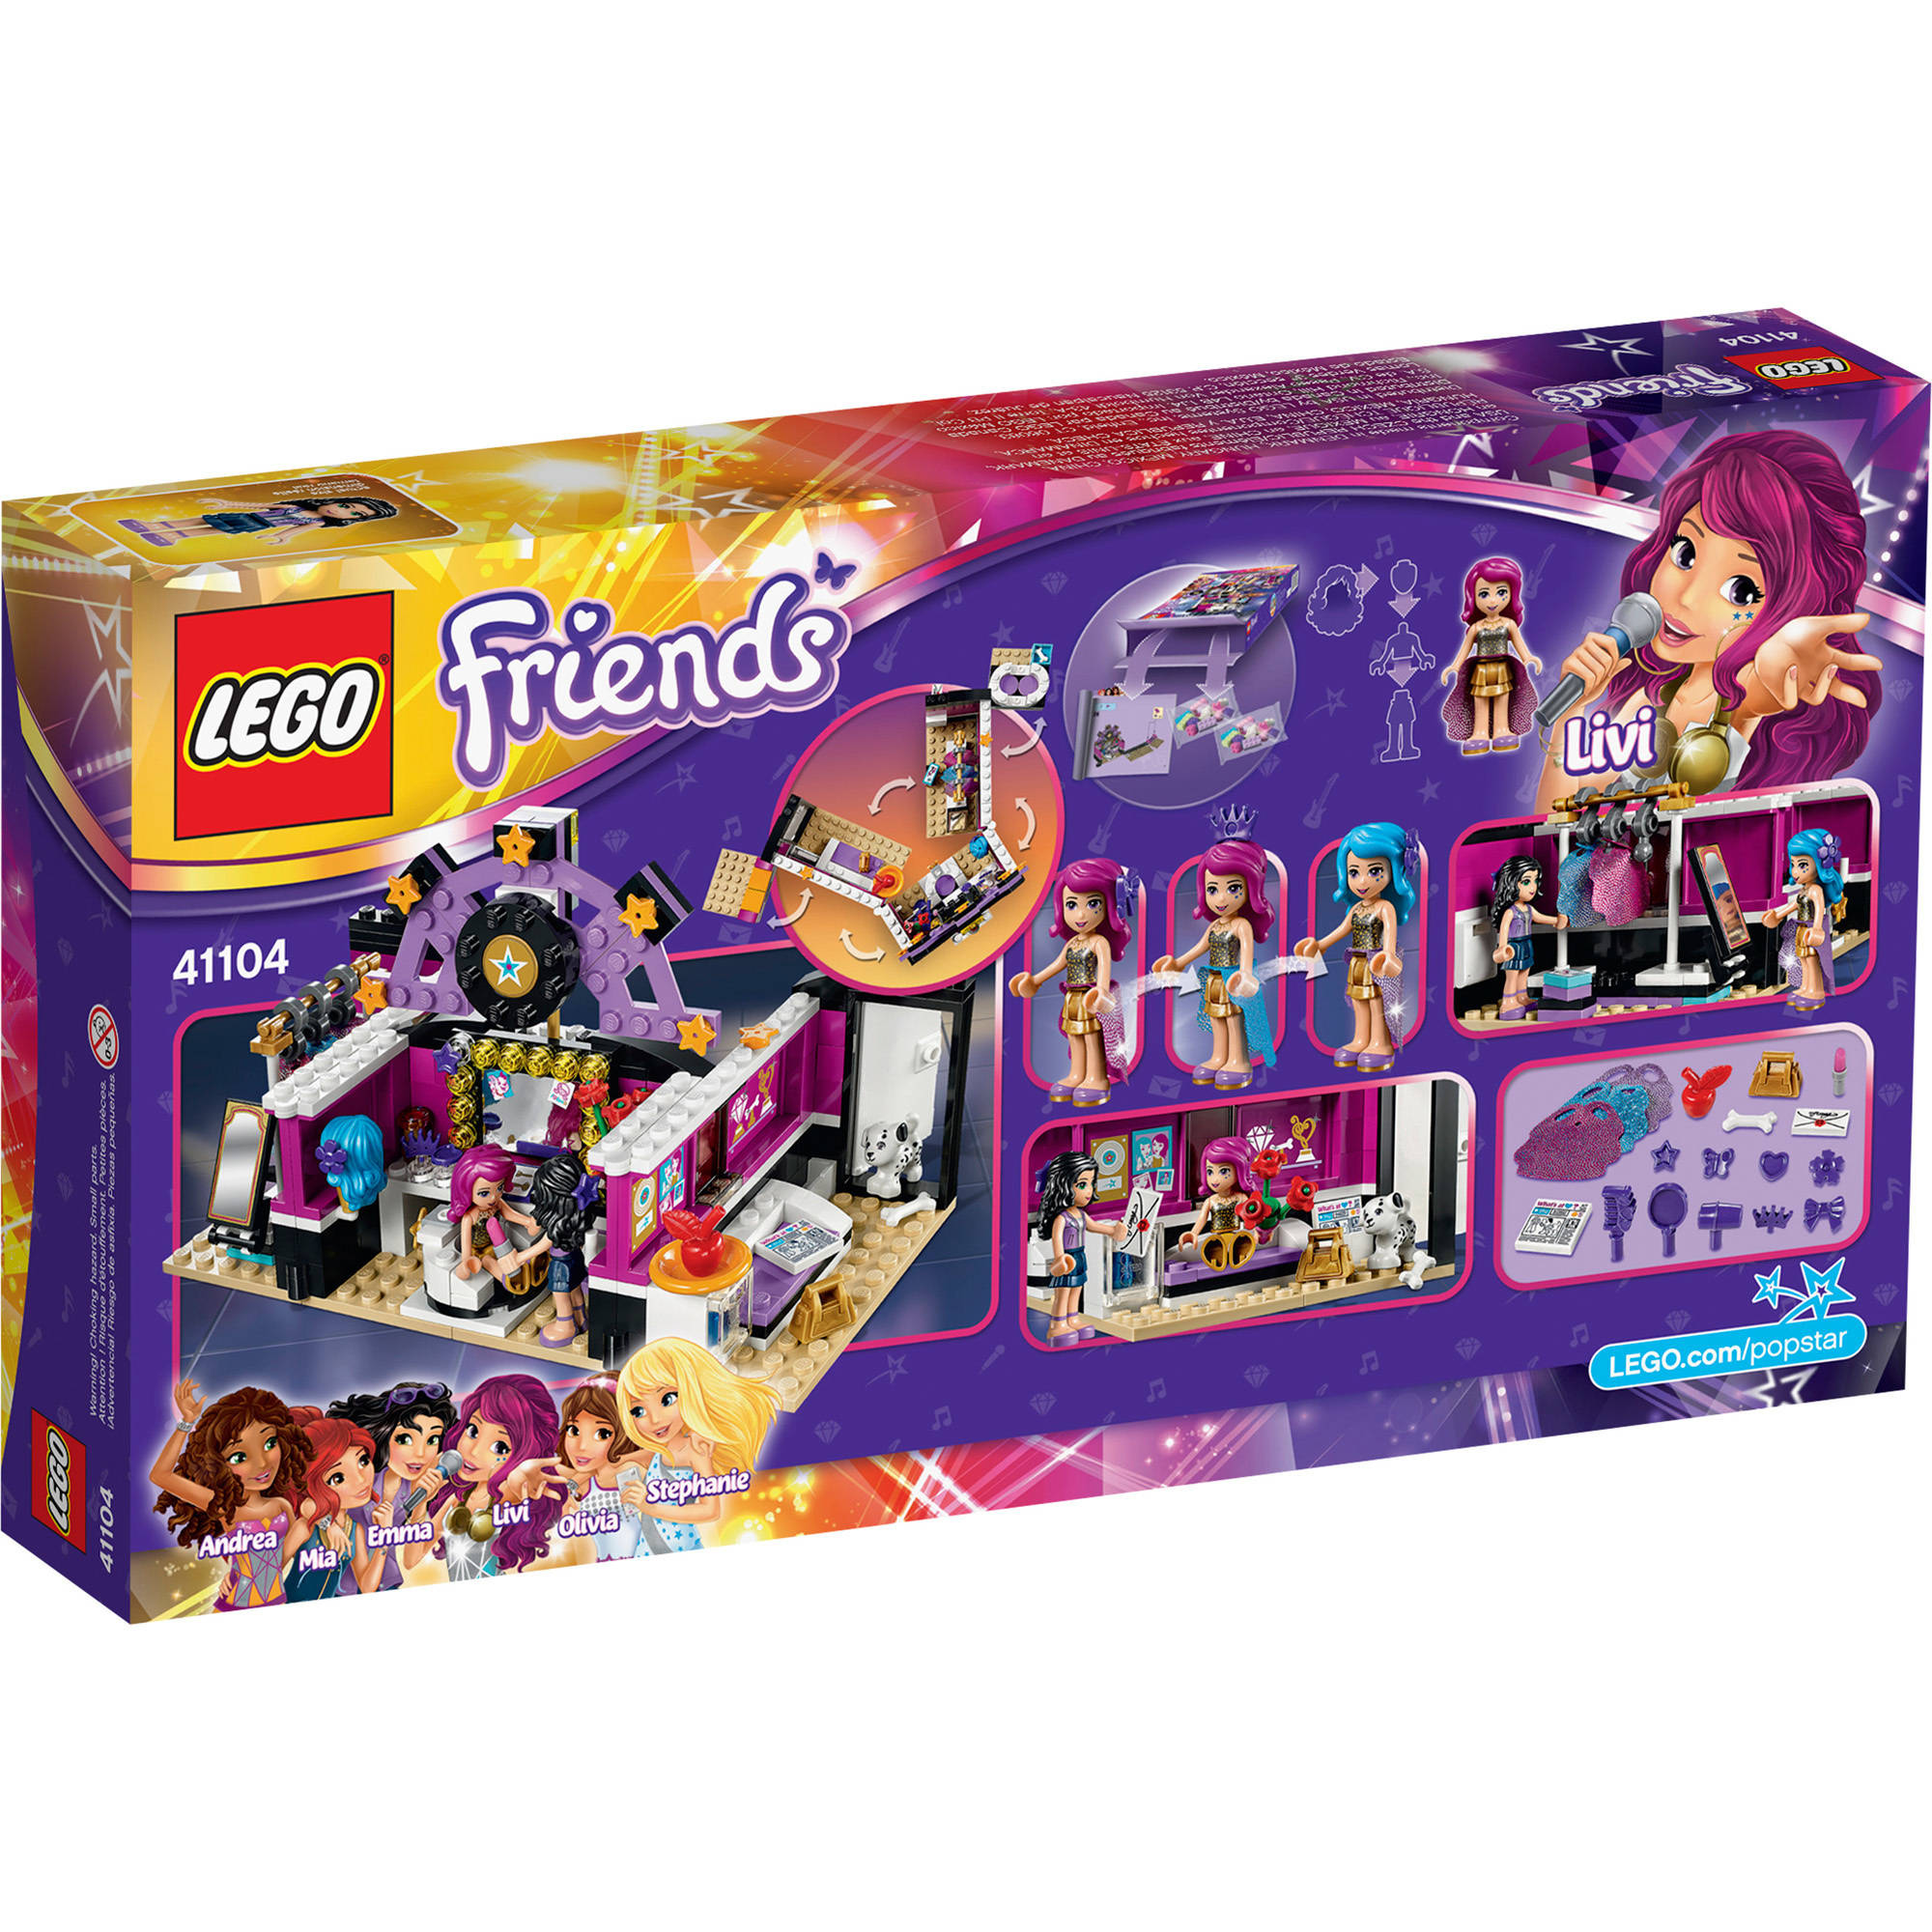 Lego Friends 41104 Pop Star Dressing Room Building Kit Walmartcom